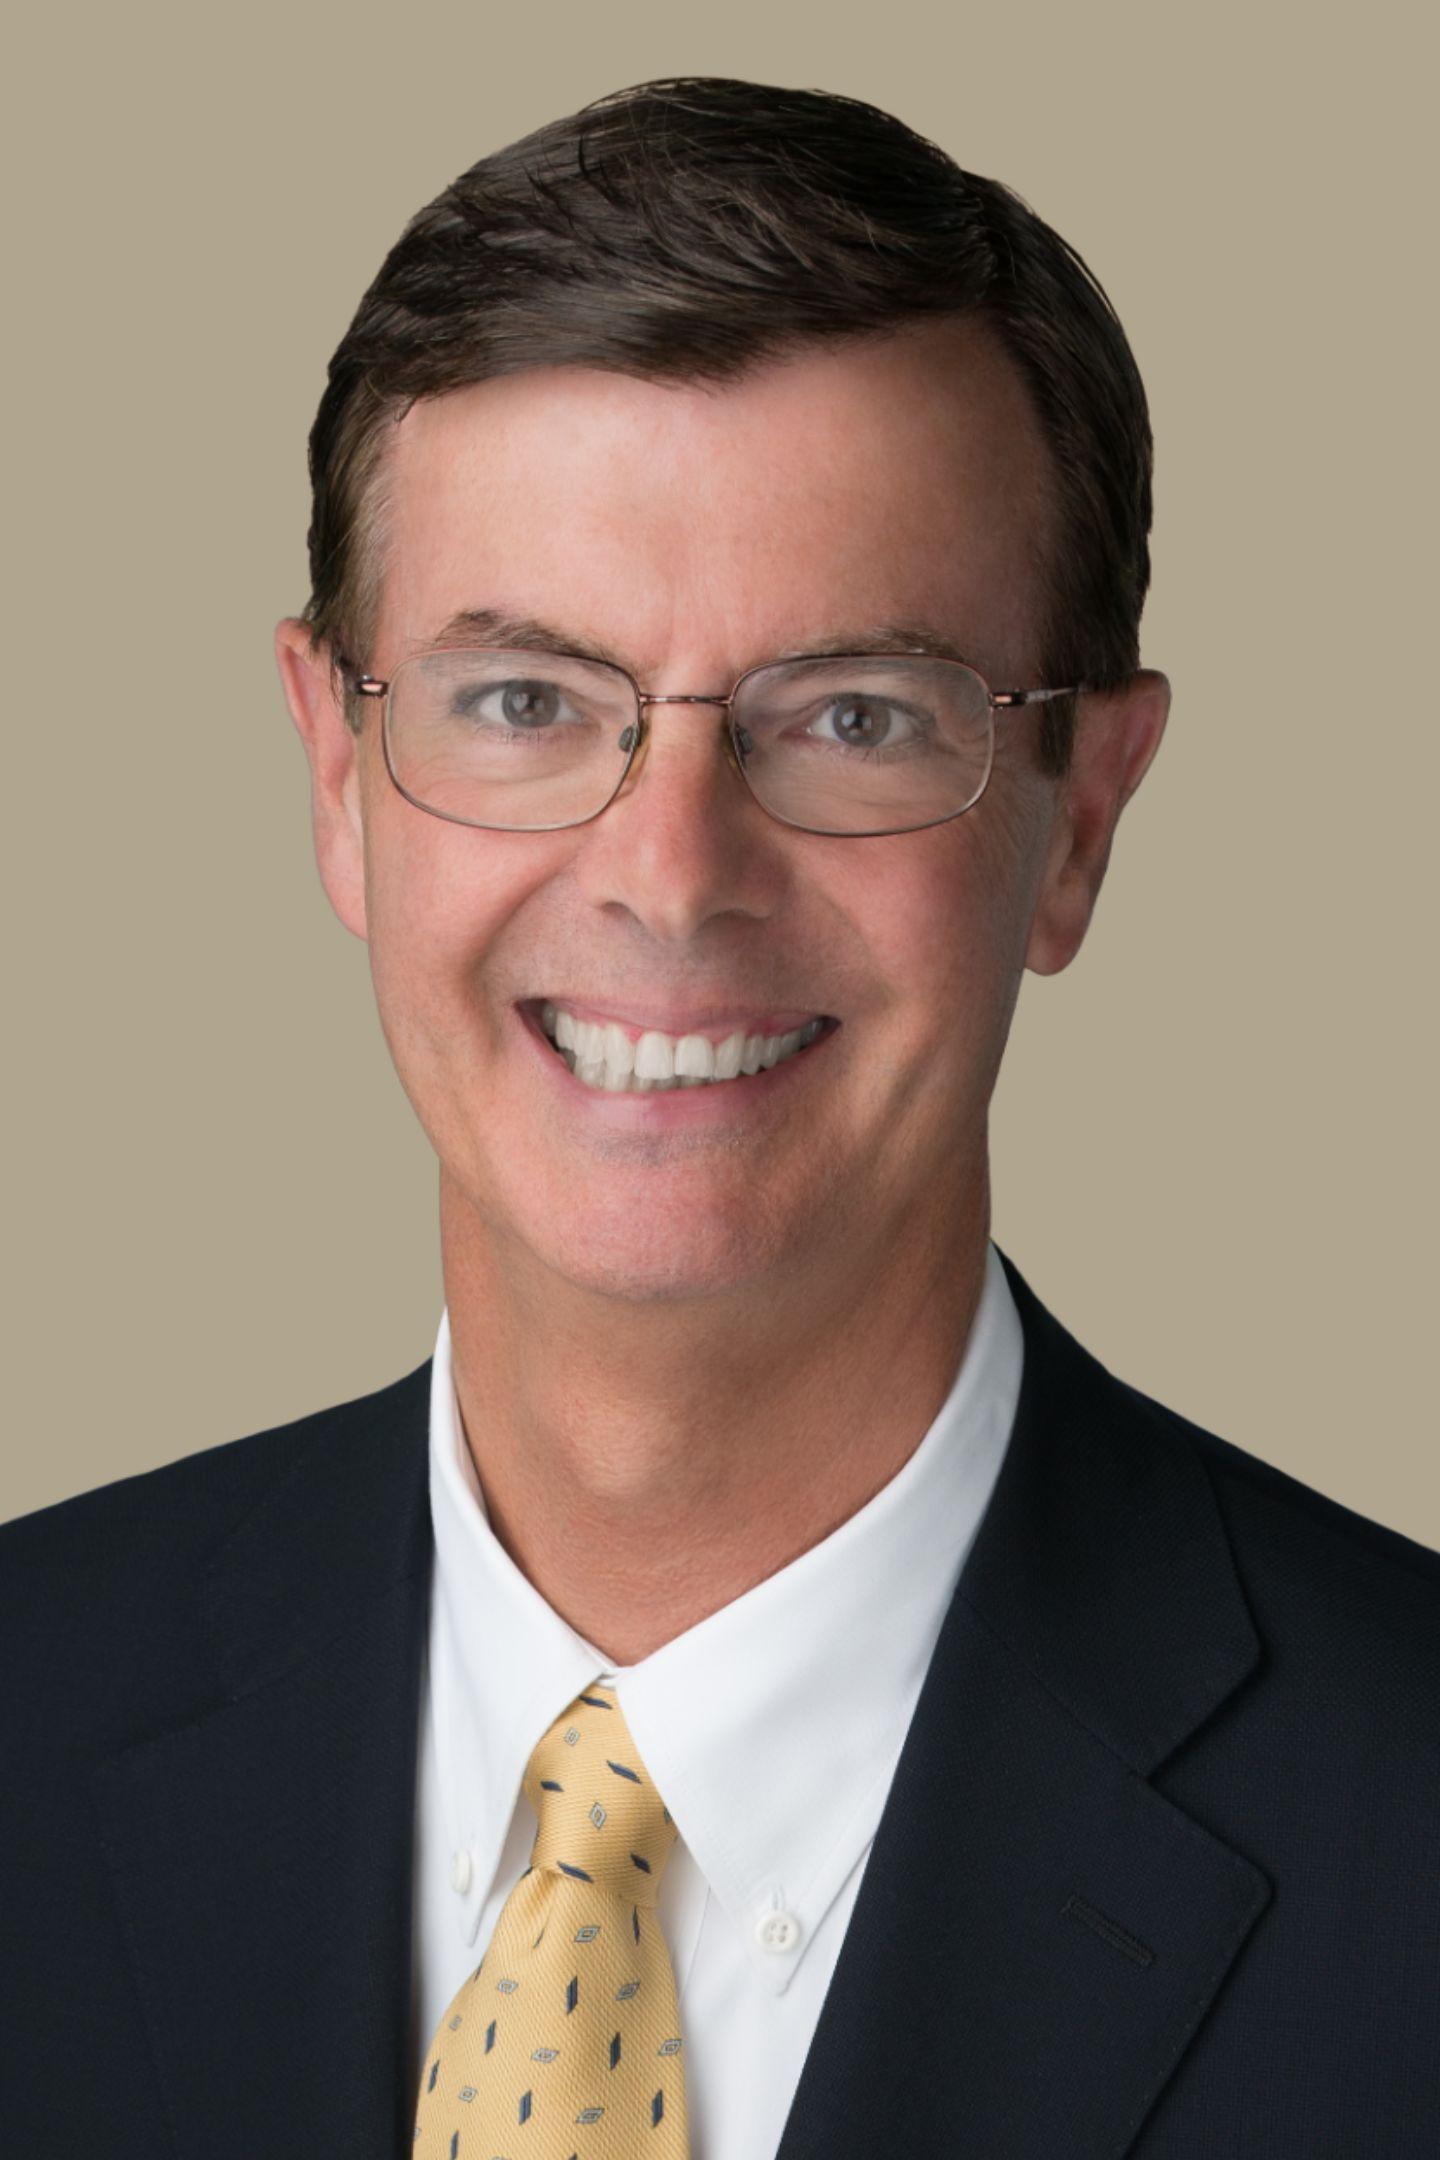 Clark Keppel, Real Estate Agent - Yorba Linda, CA